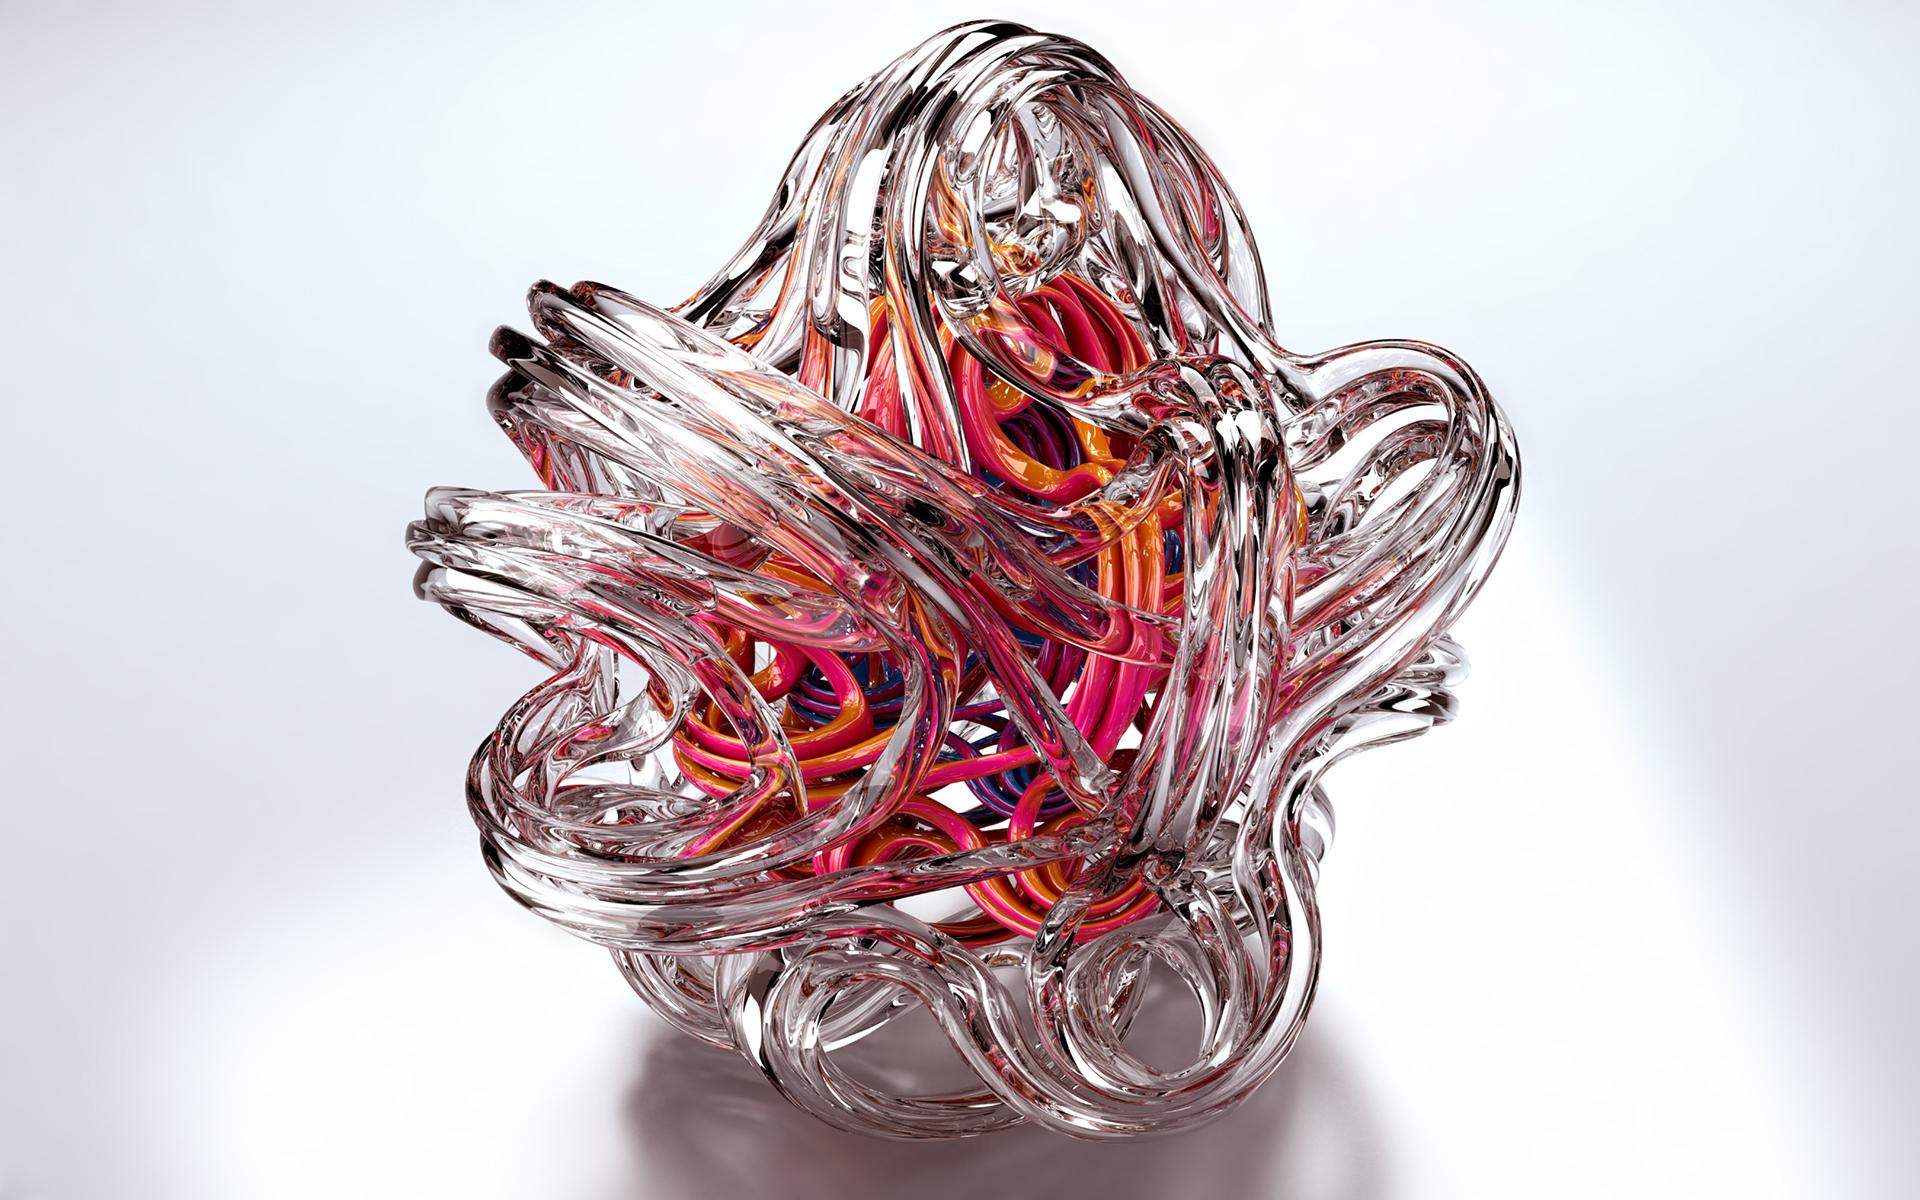 Artistic 3D Art 1920x1200